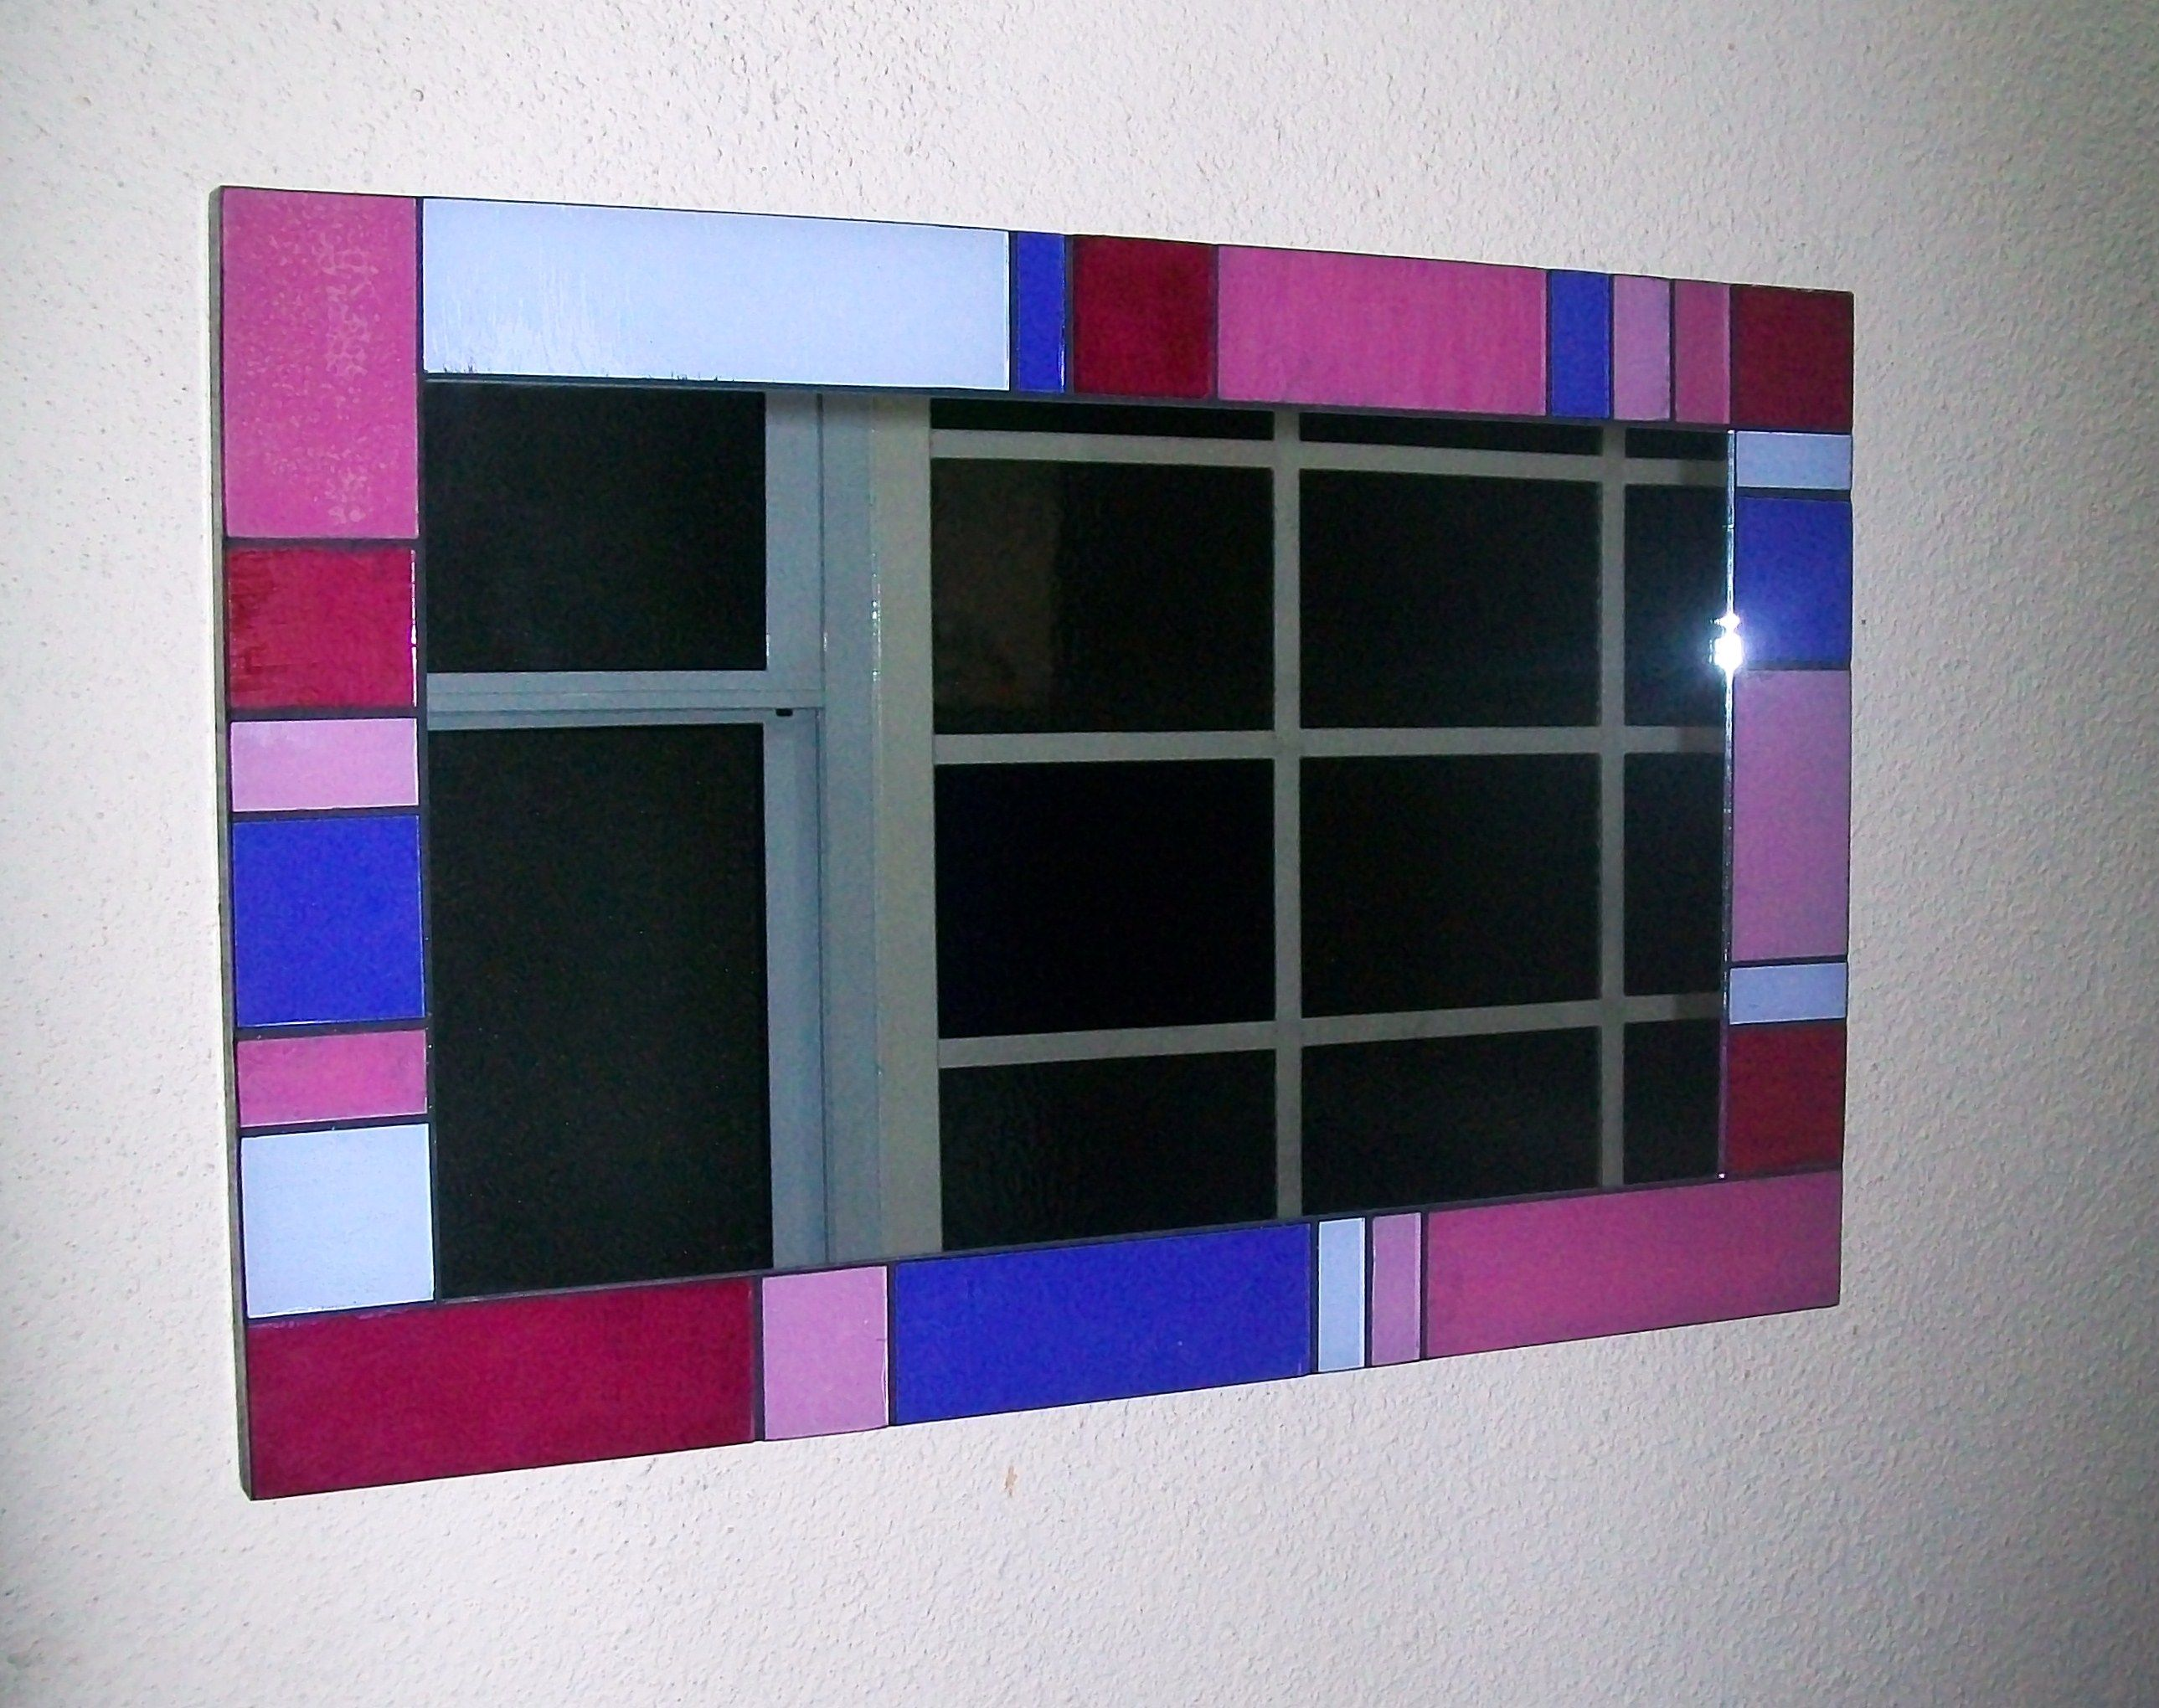 Espejos Vitral. Espejos Pintados a Mano. | Espejos | Pinterest